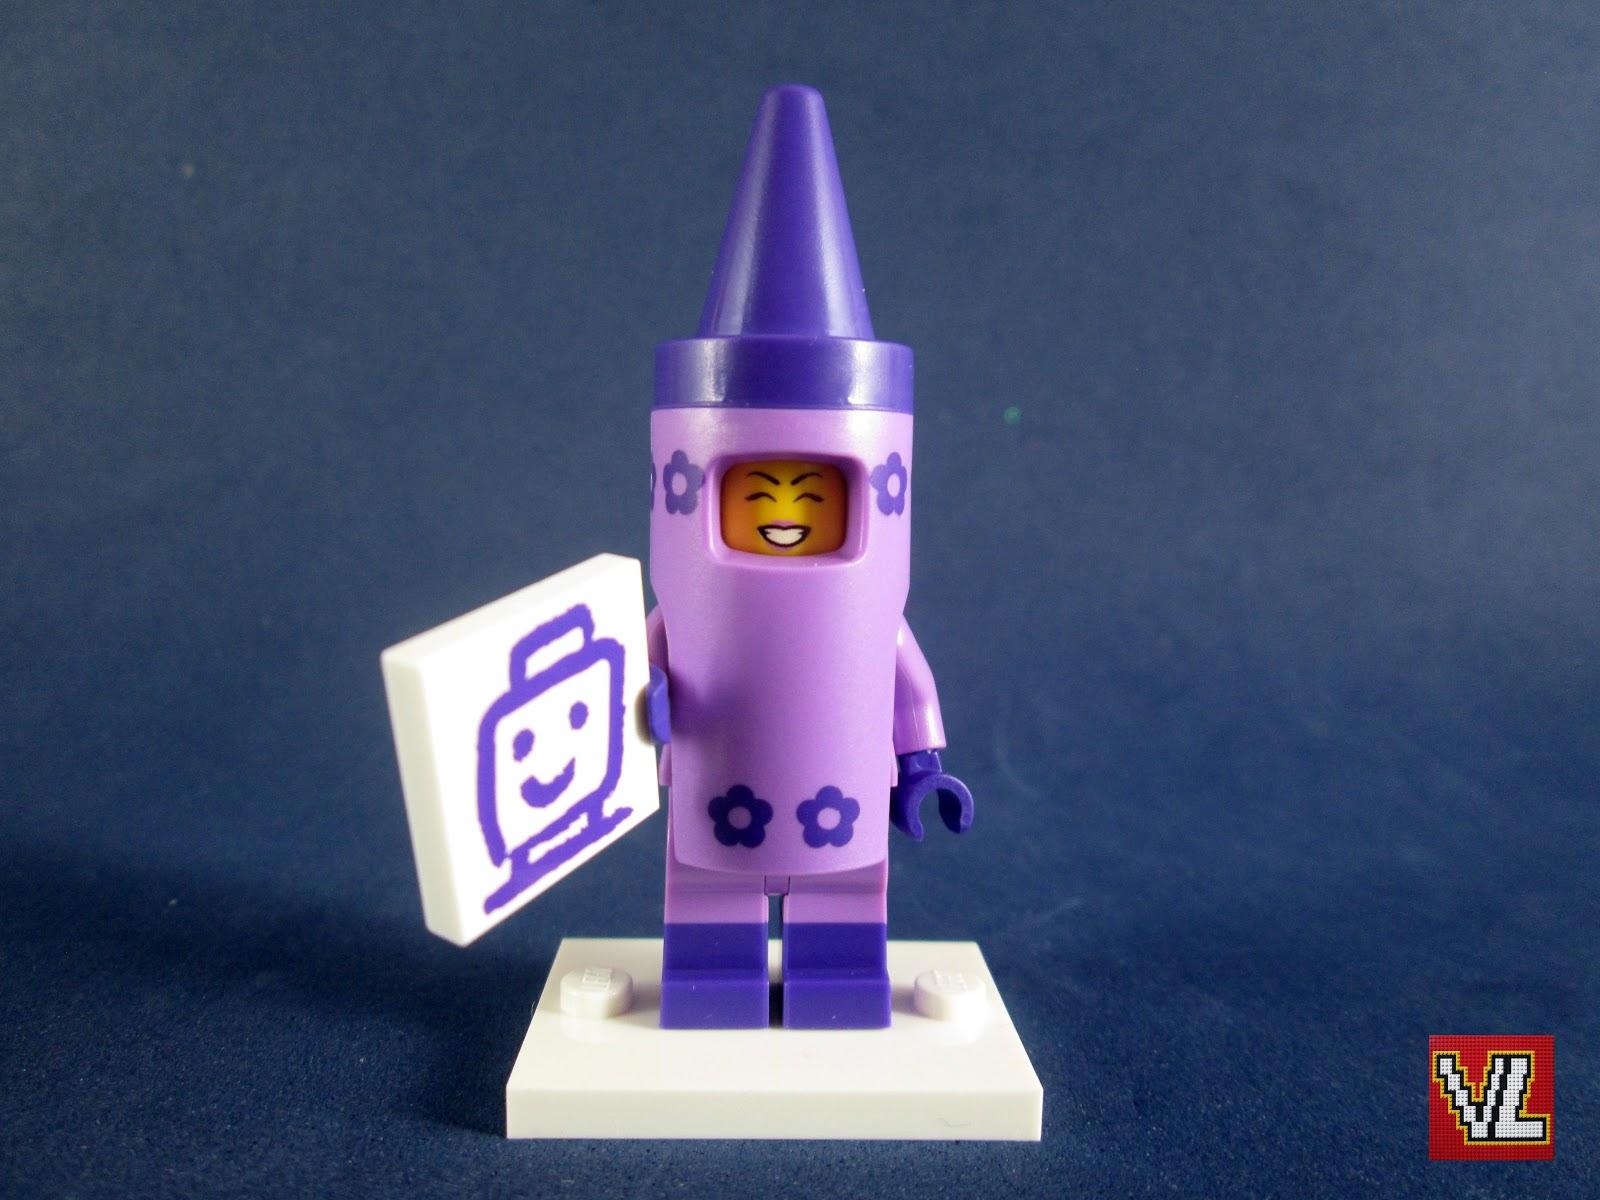 Lego The Lego Movie 2 Mini Figure Collection #5 Crayon Girl